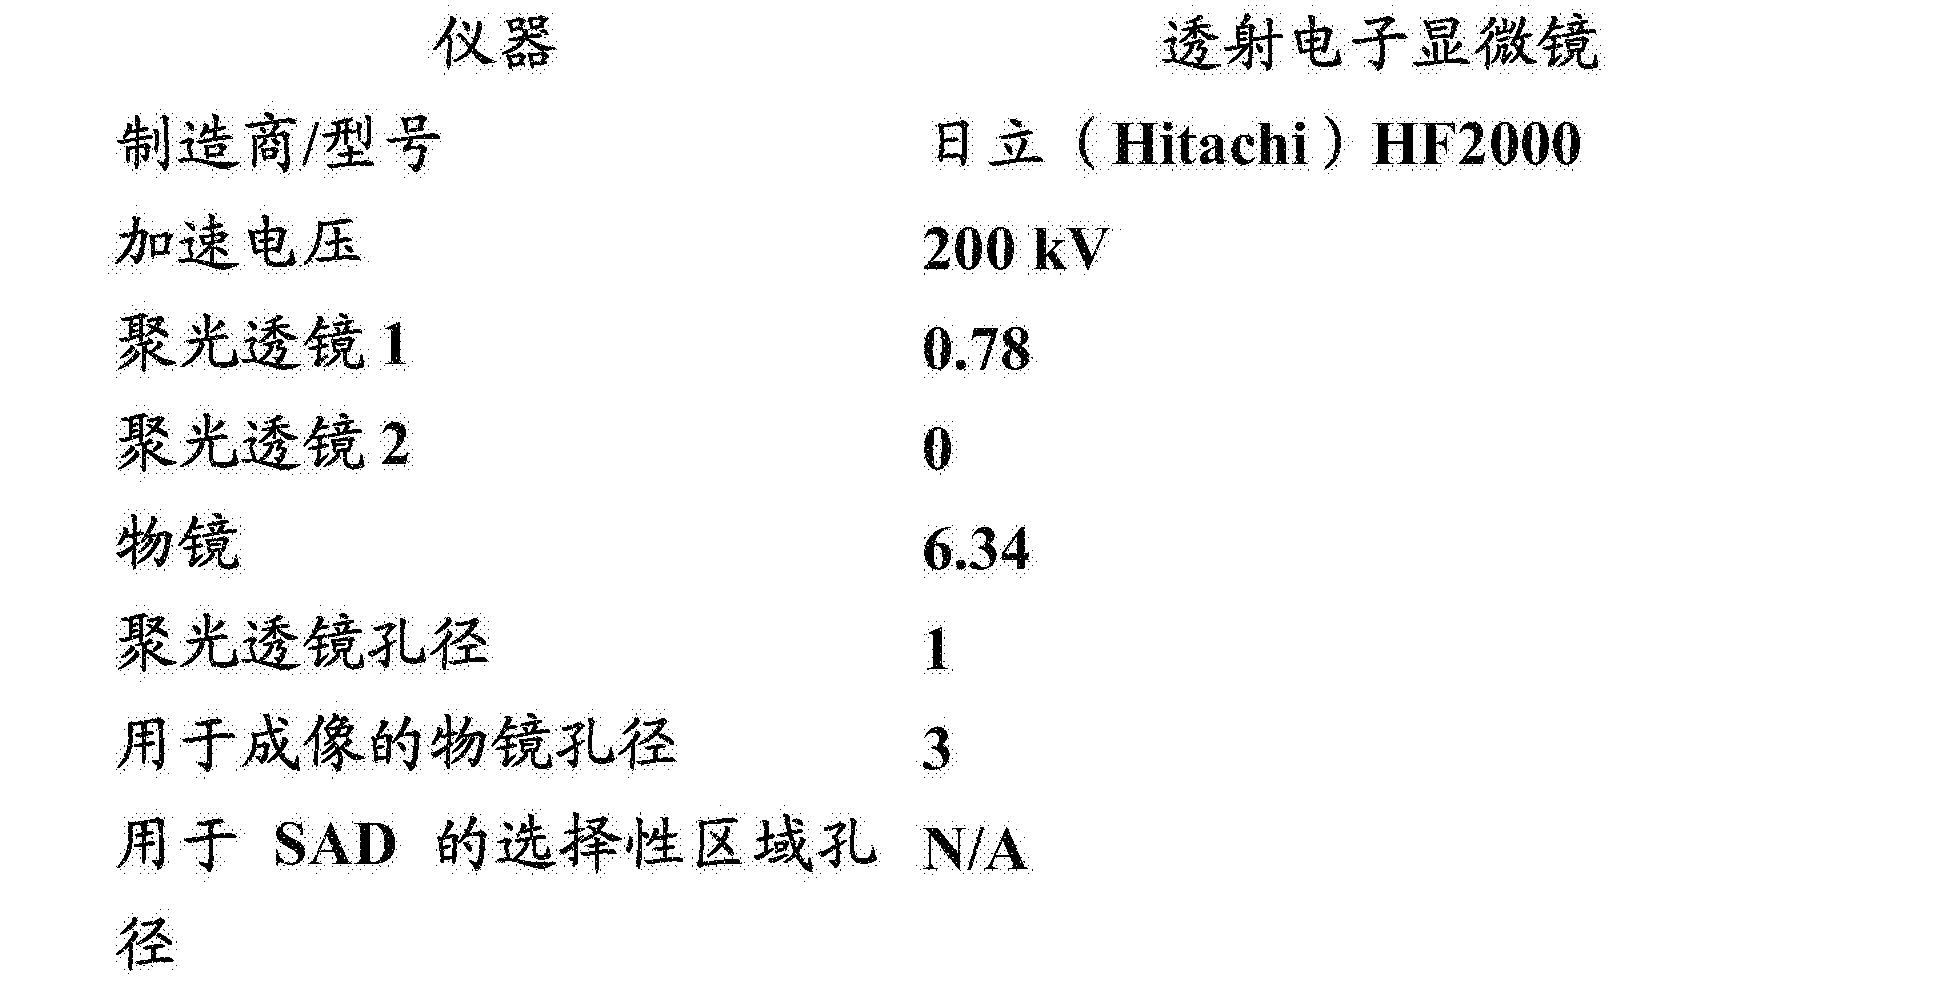 Figure CN108883172AD00442